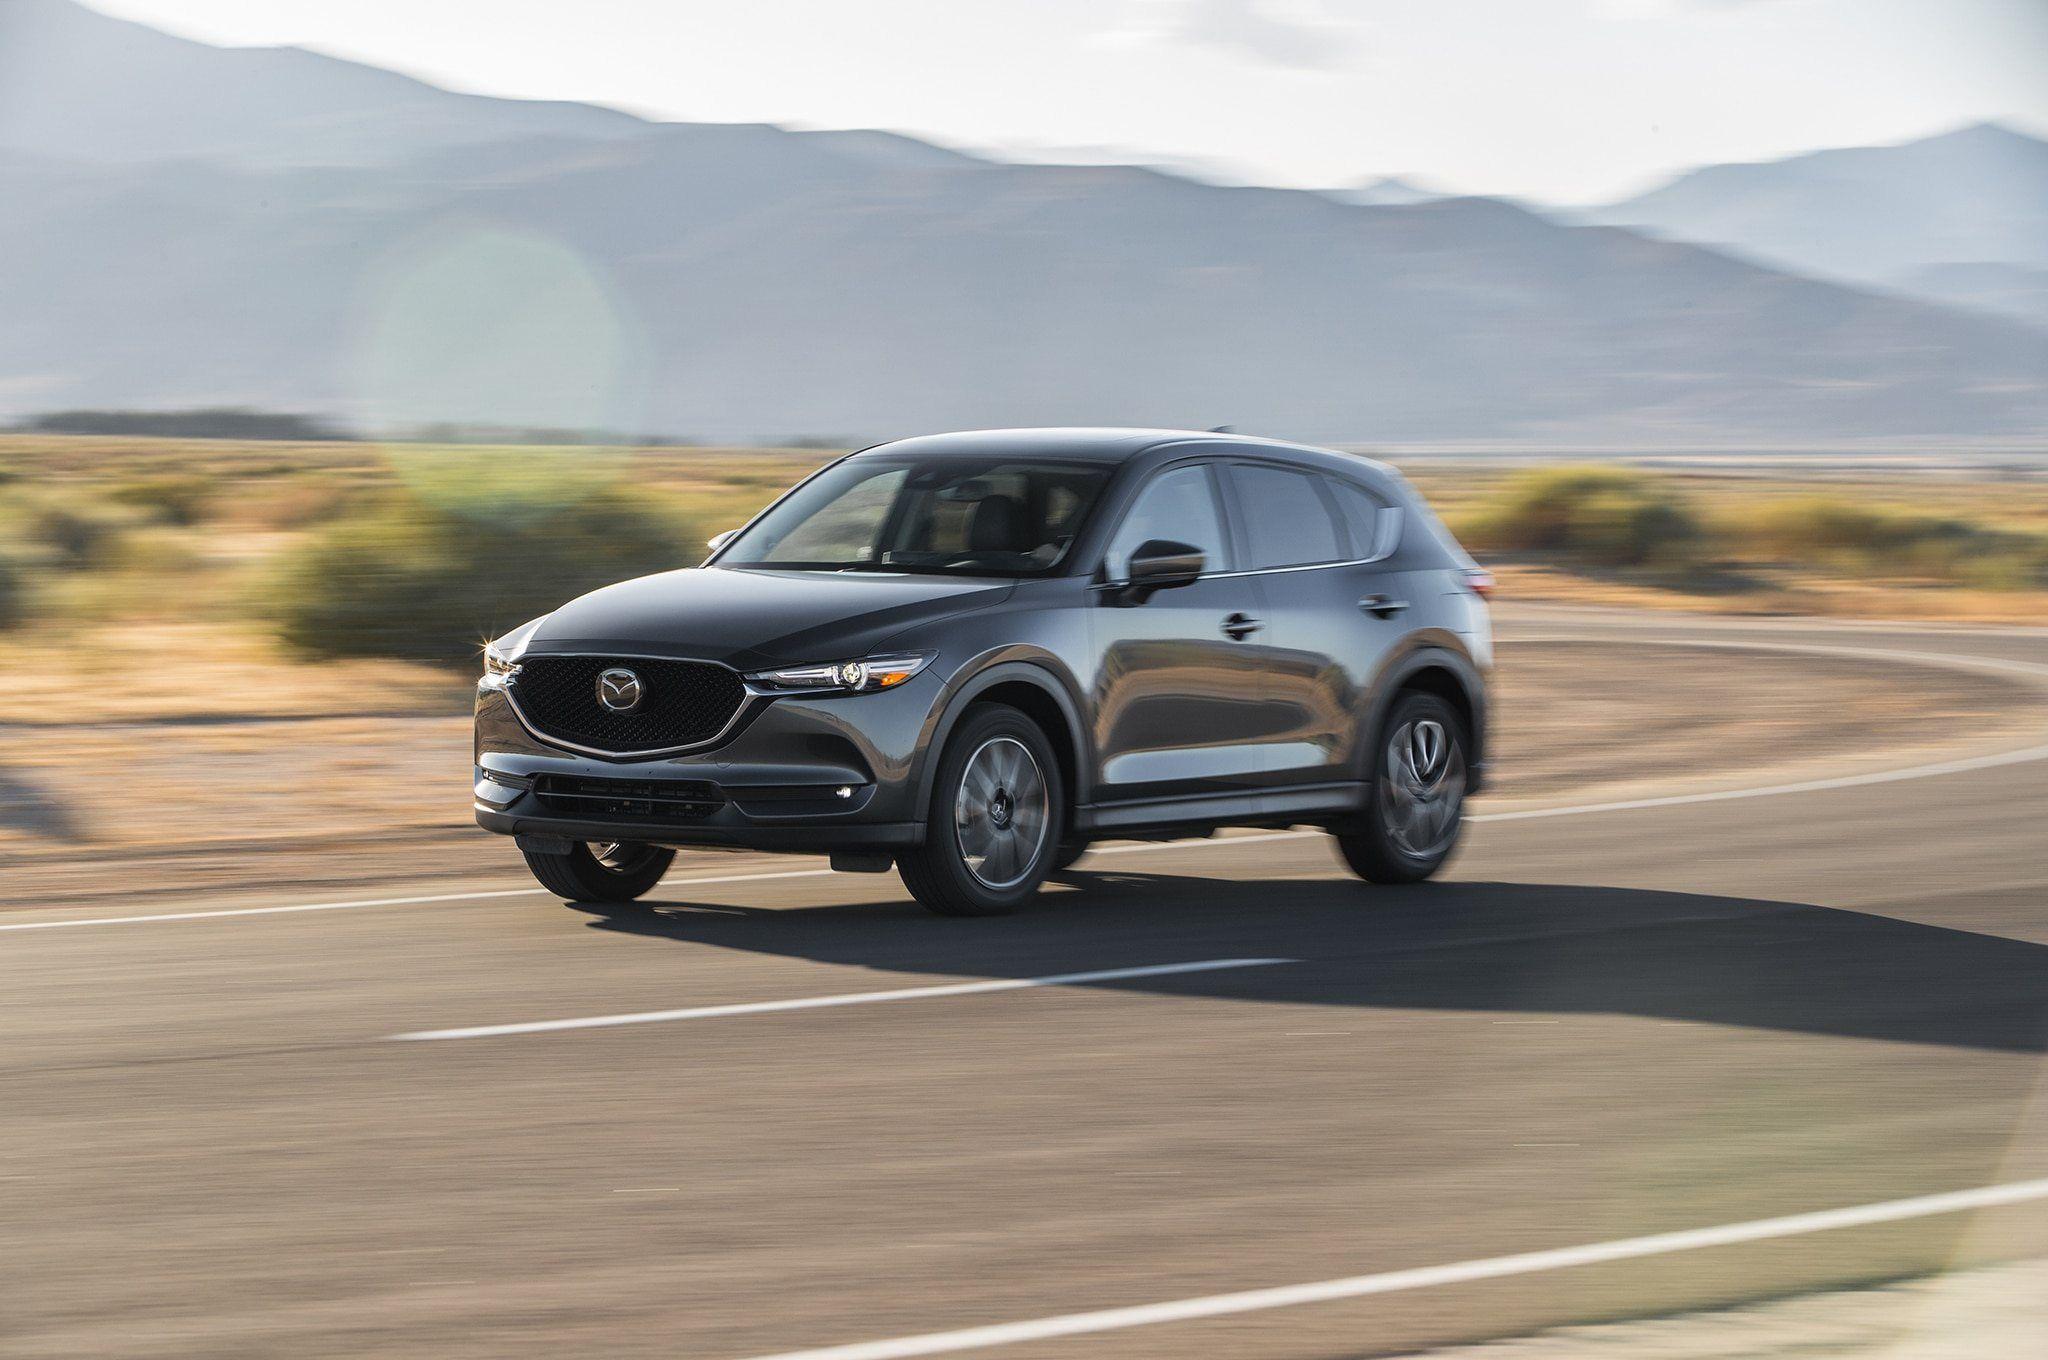 2021 Mazda Cx 7 Release Date And Concept In 2020 Mazda Cx 9 Mazda Cx 7 Mazda